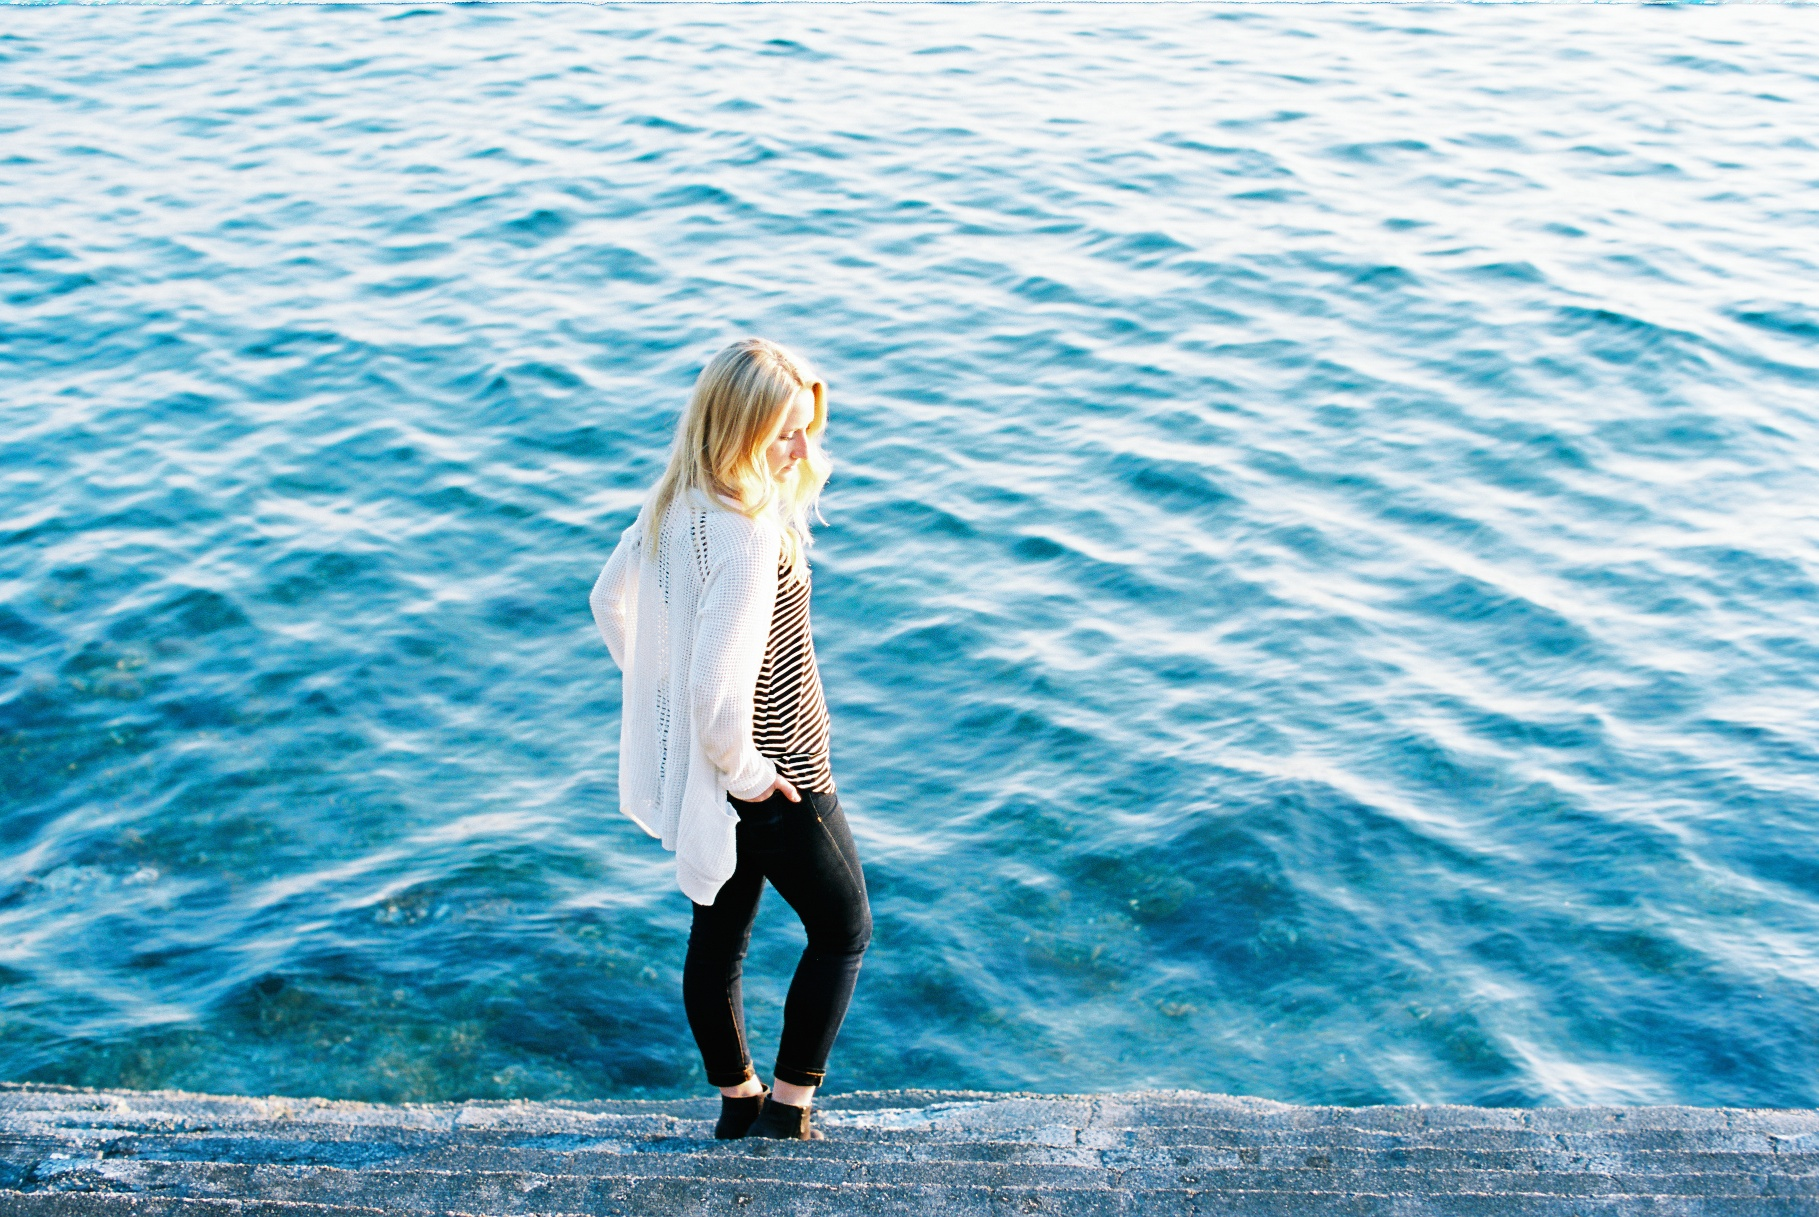 seattle film photographer senior pictures photos alki beach west seattle ocean ektar 100 canon